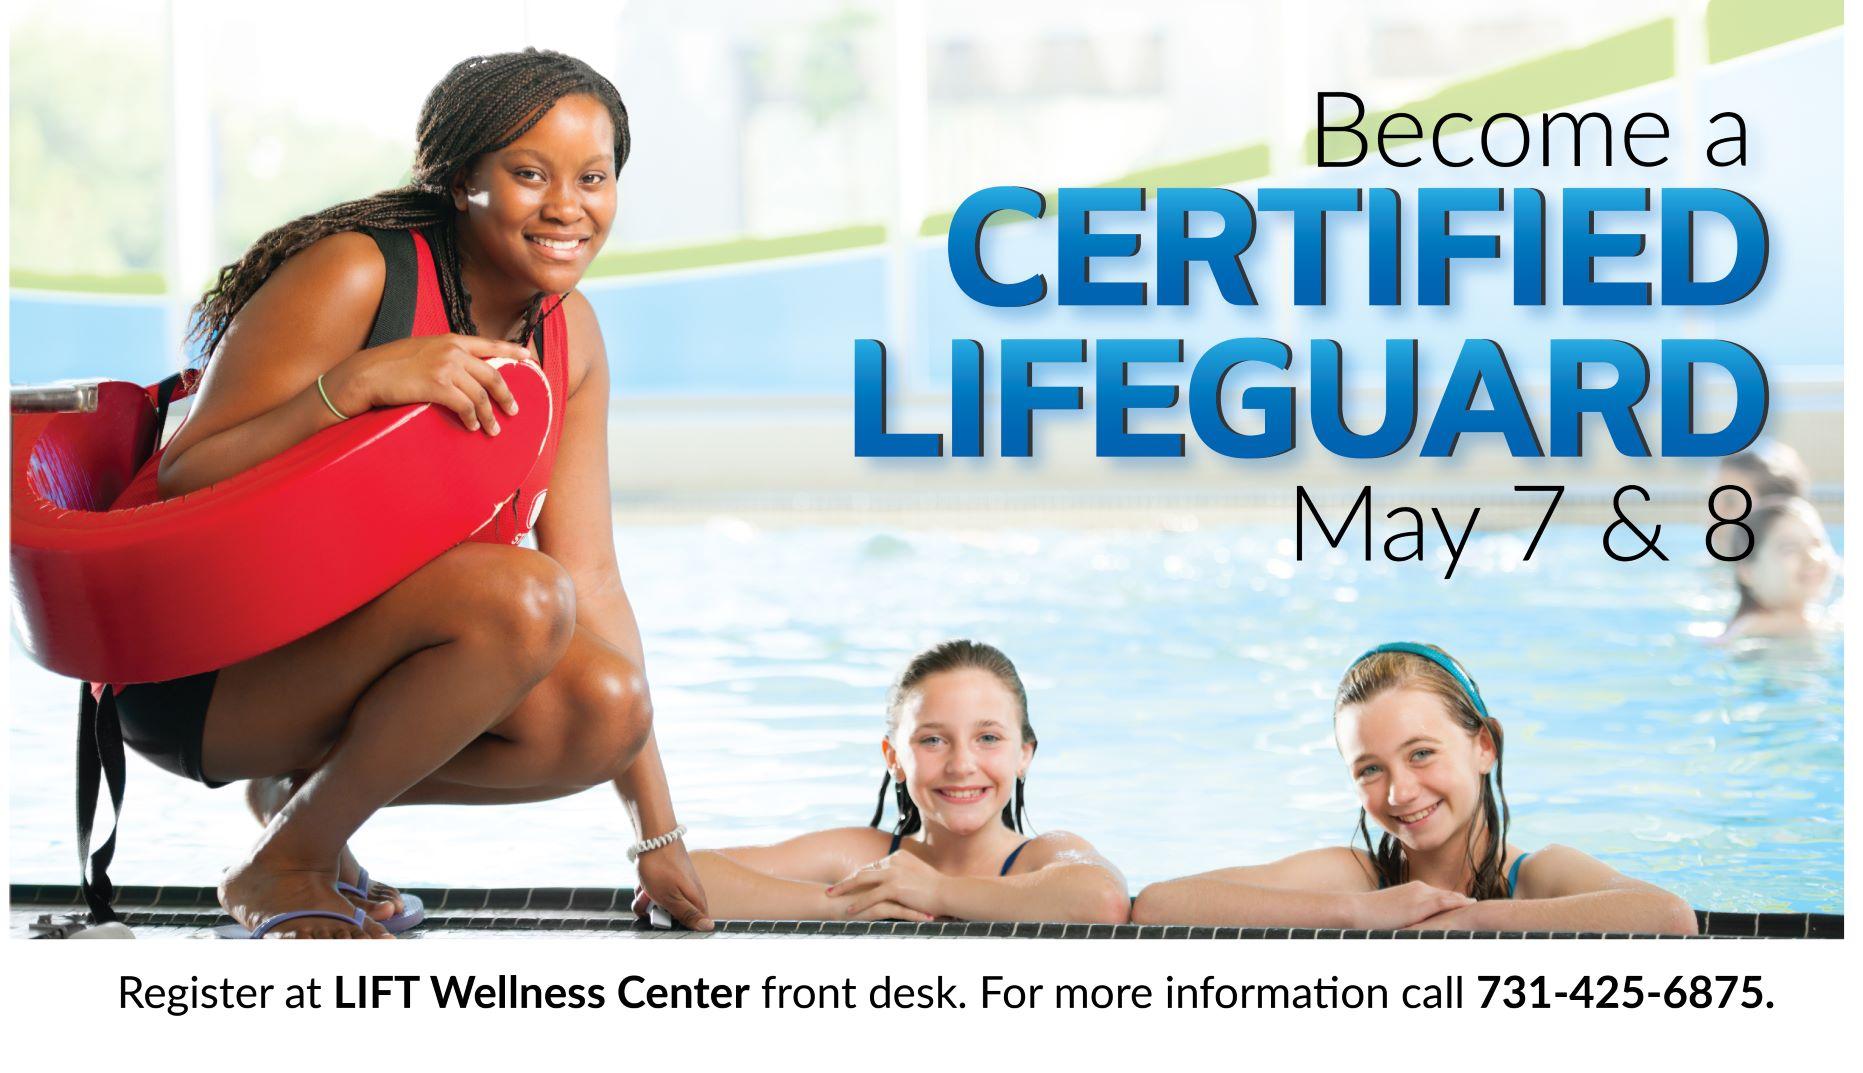 Lifeguard Certification & Recertification Course